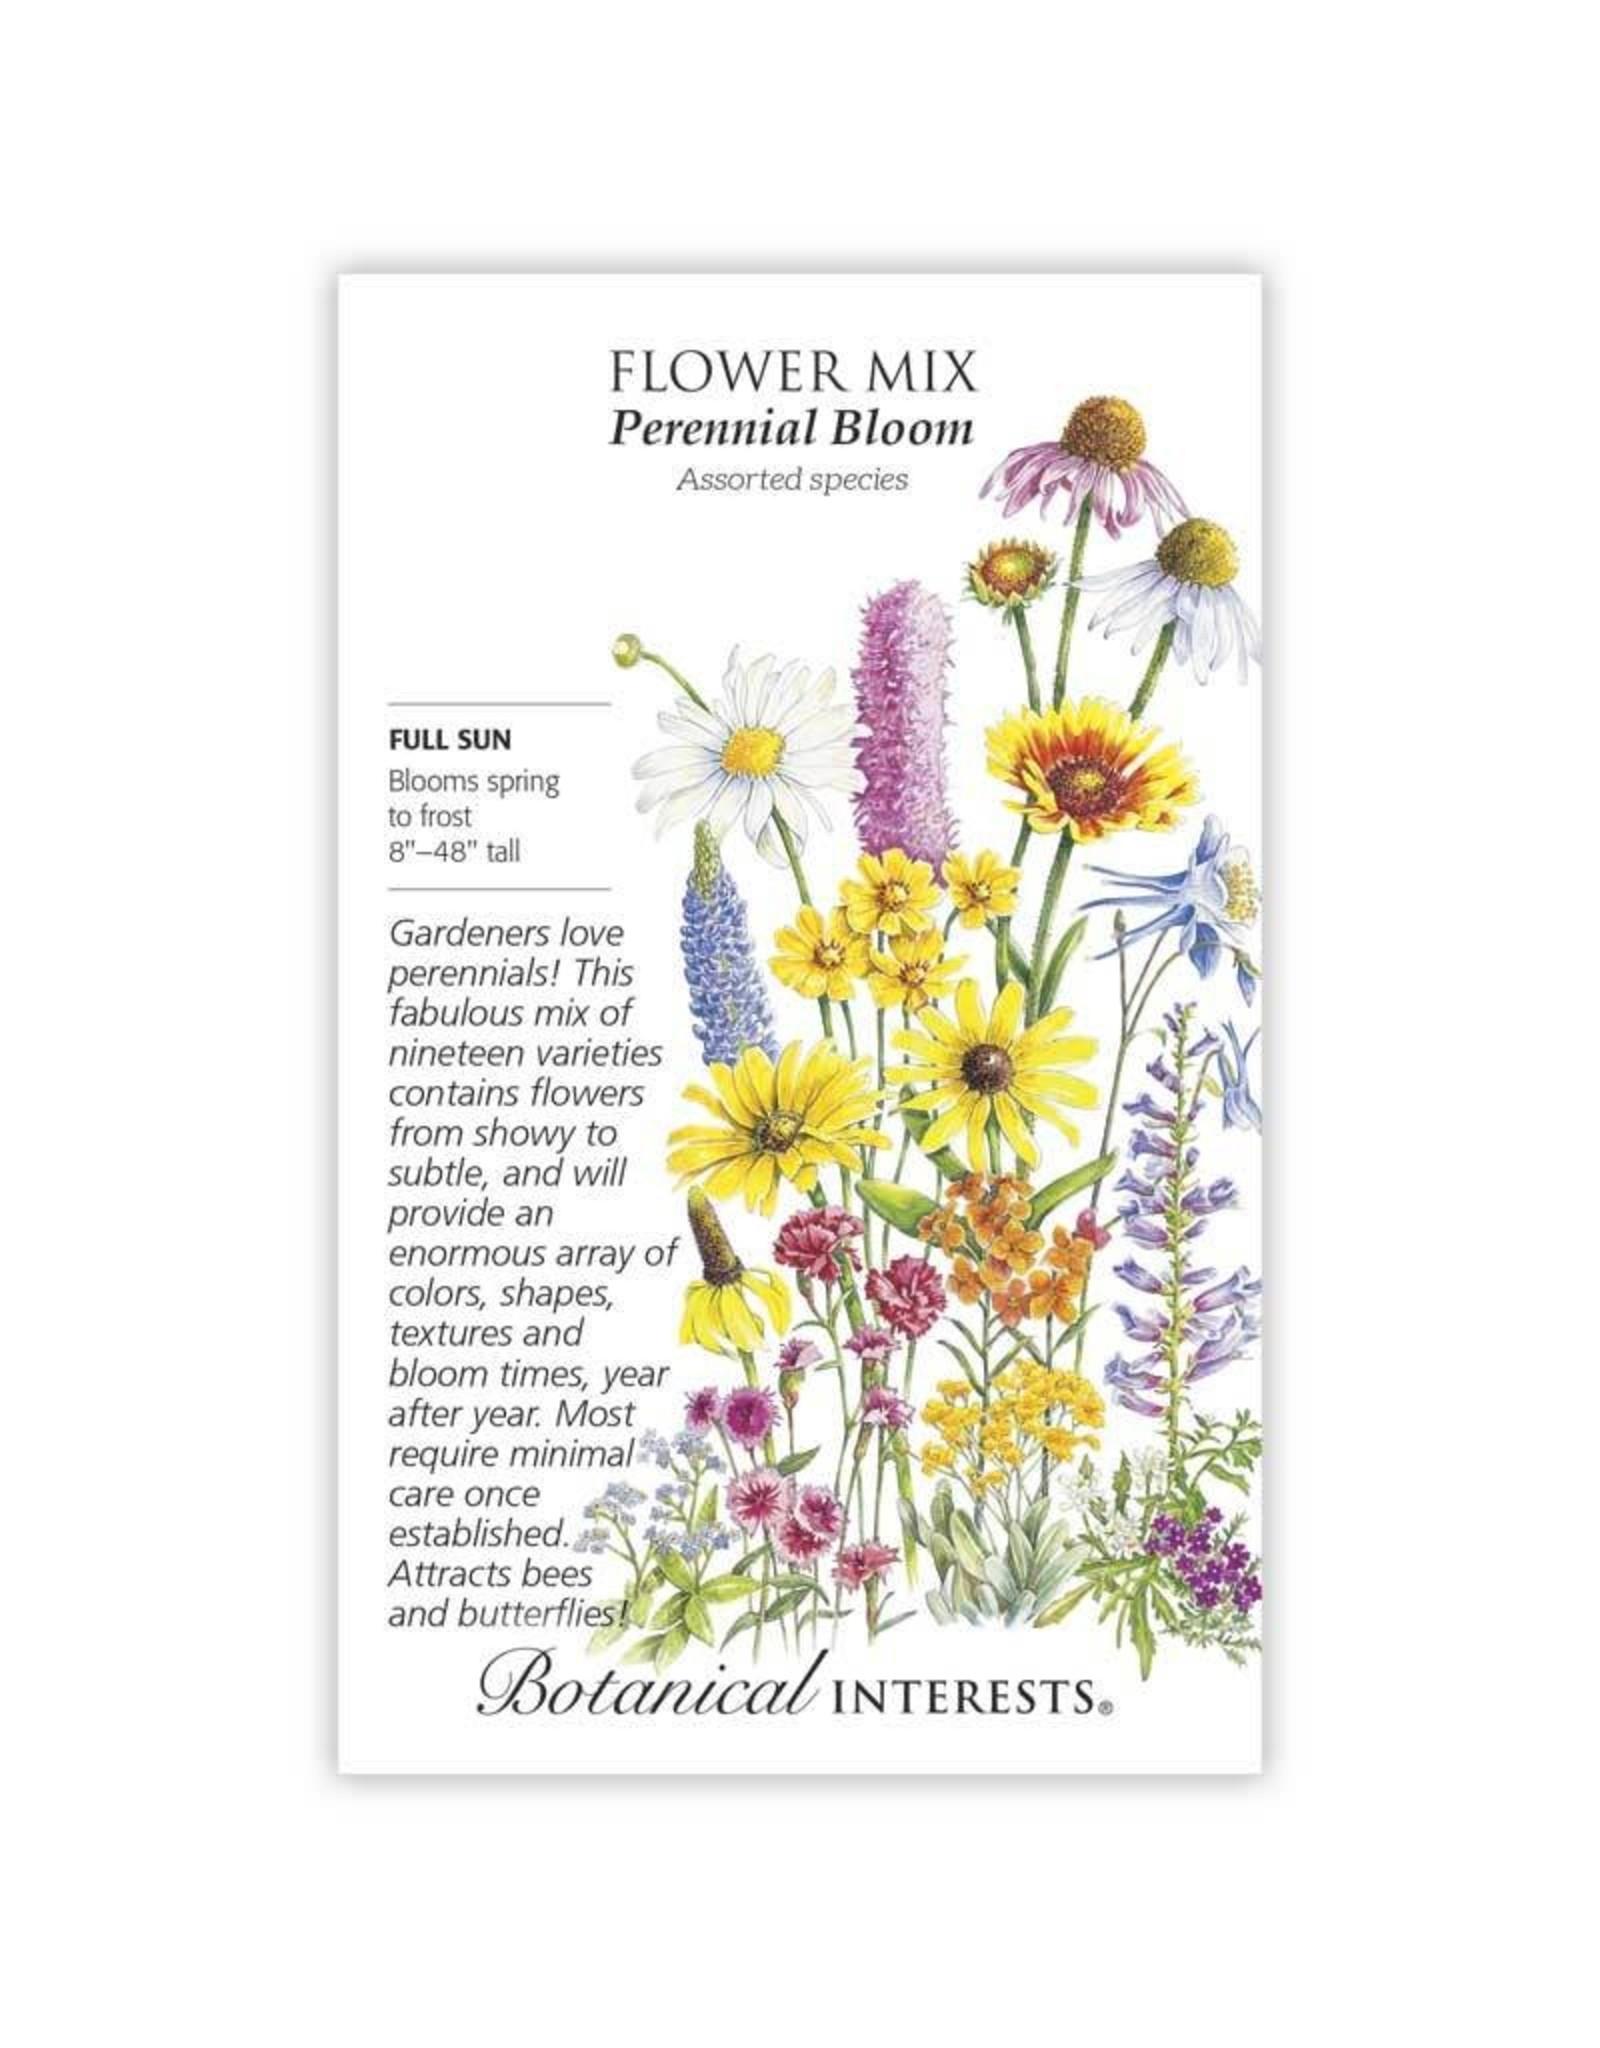 Seeds - Flower Mix Perennial Bloom, Large